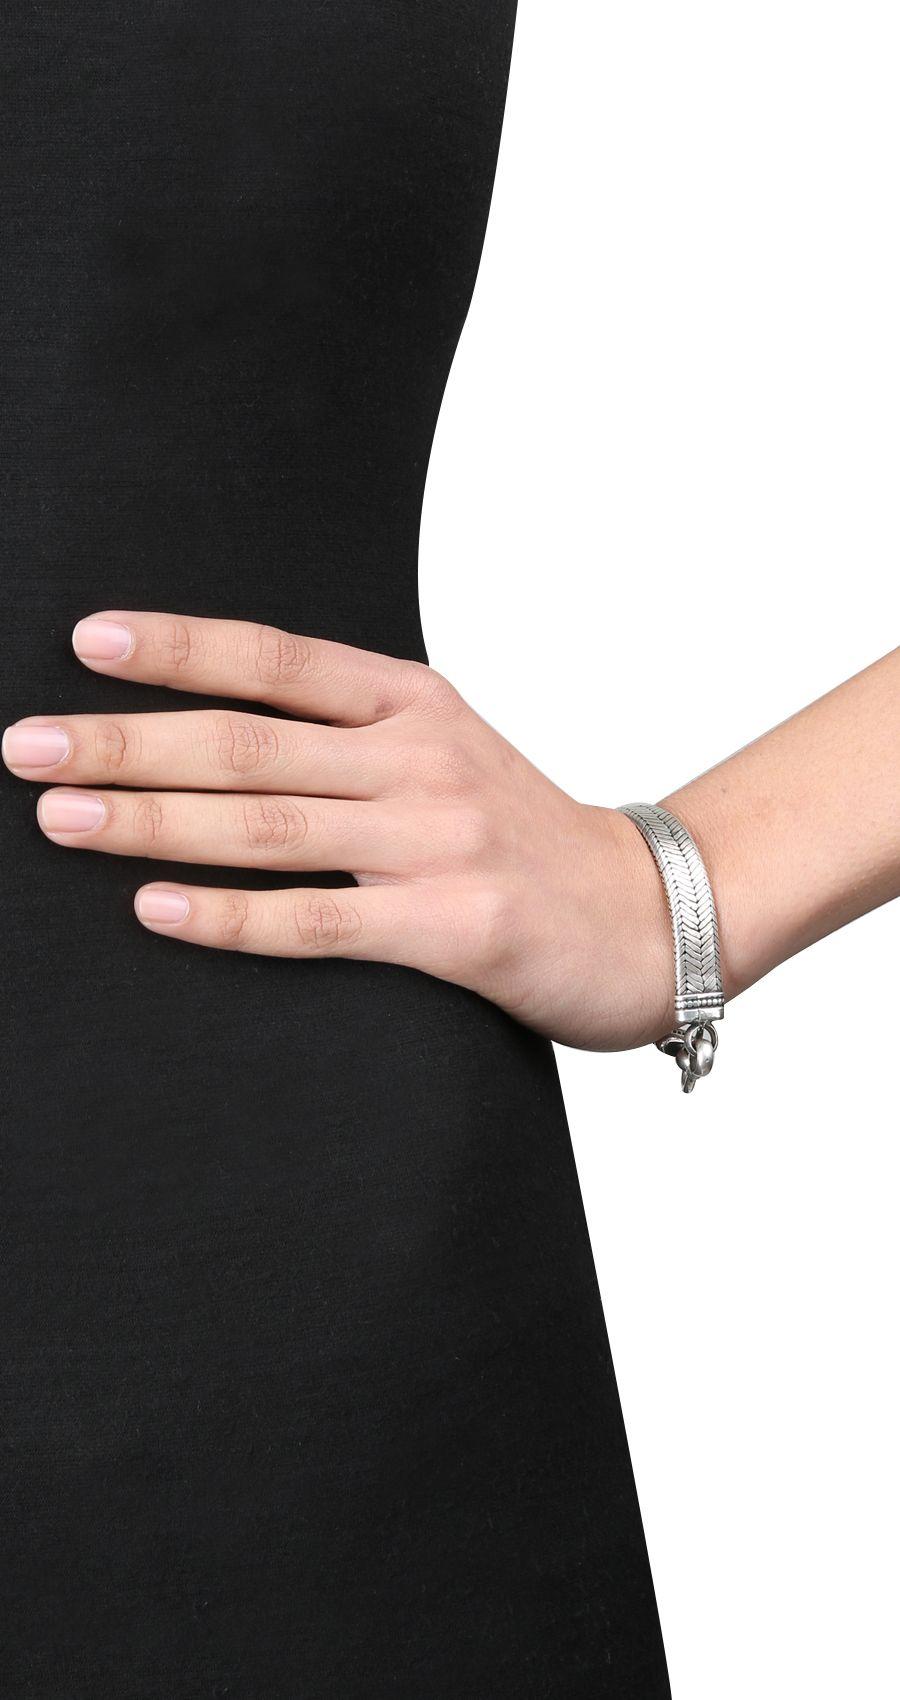 Oxidised silver chain bracelet by AMRAPALI. Shop at https://www.perniaspopupshop.com/whats-new/amrapali-16